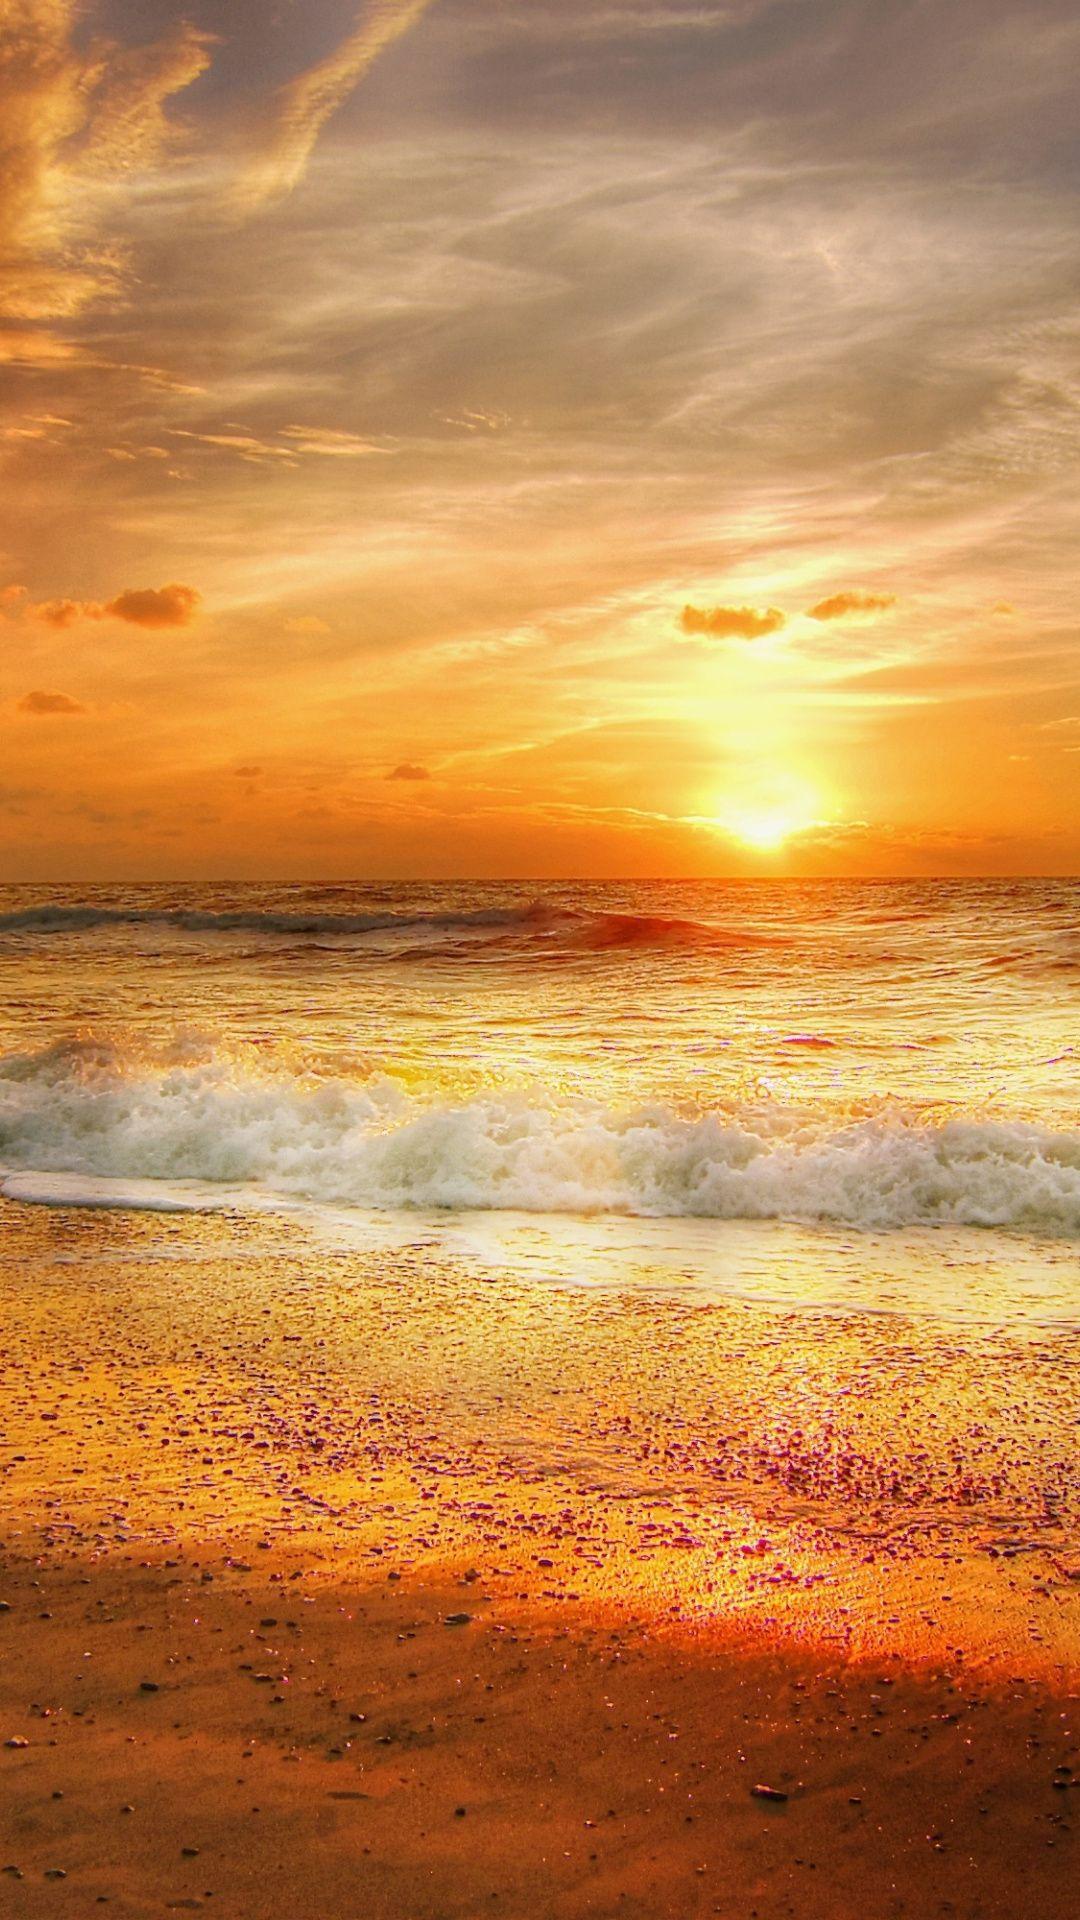 North Sea Sunset Yellow Sky Nature 1080x1920 Wallpaper